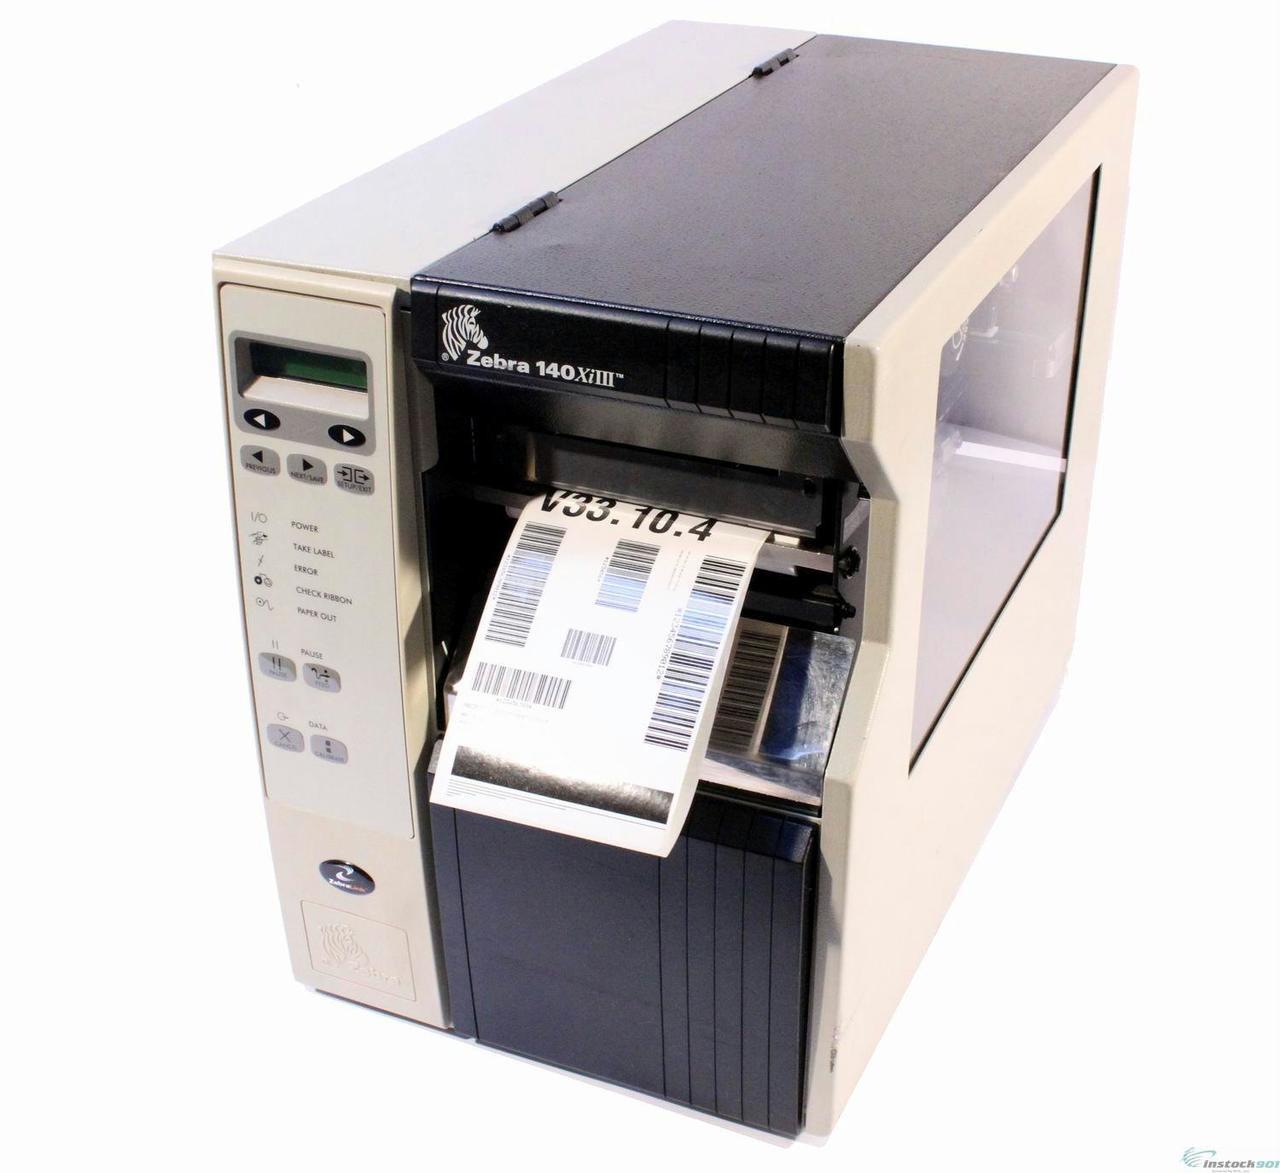 Zebra Xi Series 140XiIII - Label Printer - B/W - Direct Thermal